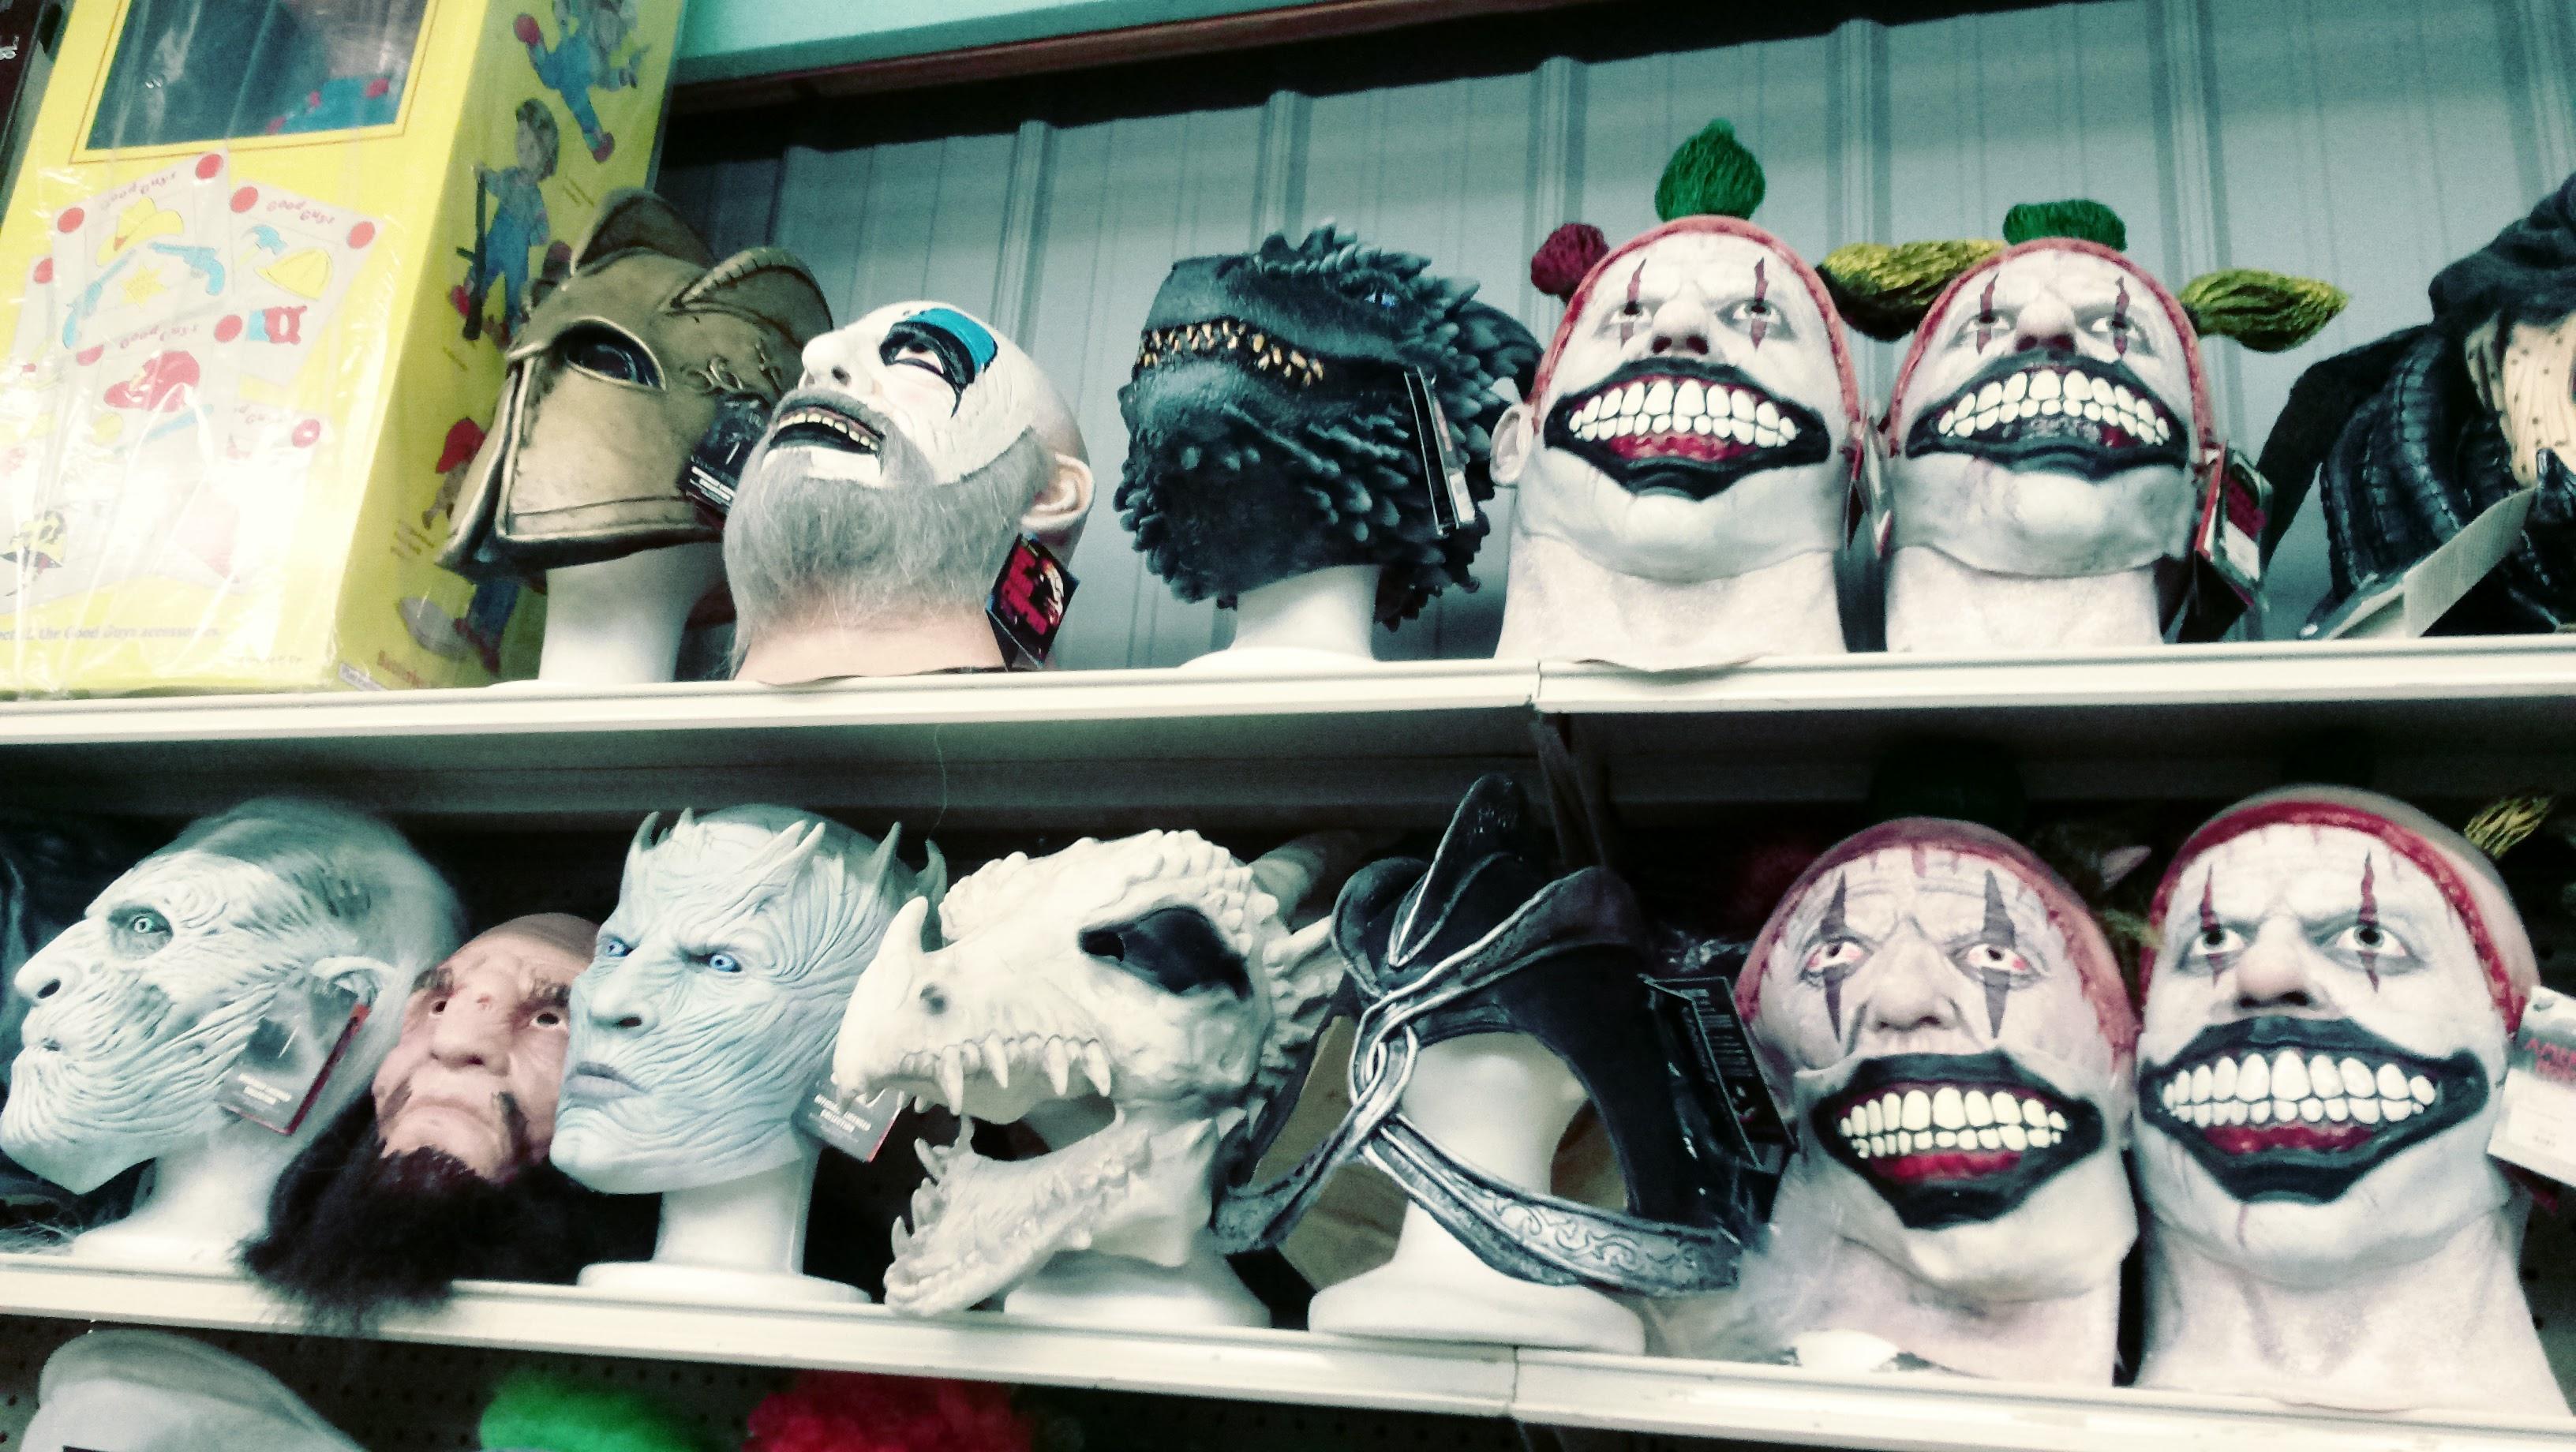 nick nackery whitewalker night king game of thrones knight monster creepy clown dragon masks